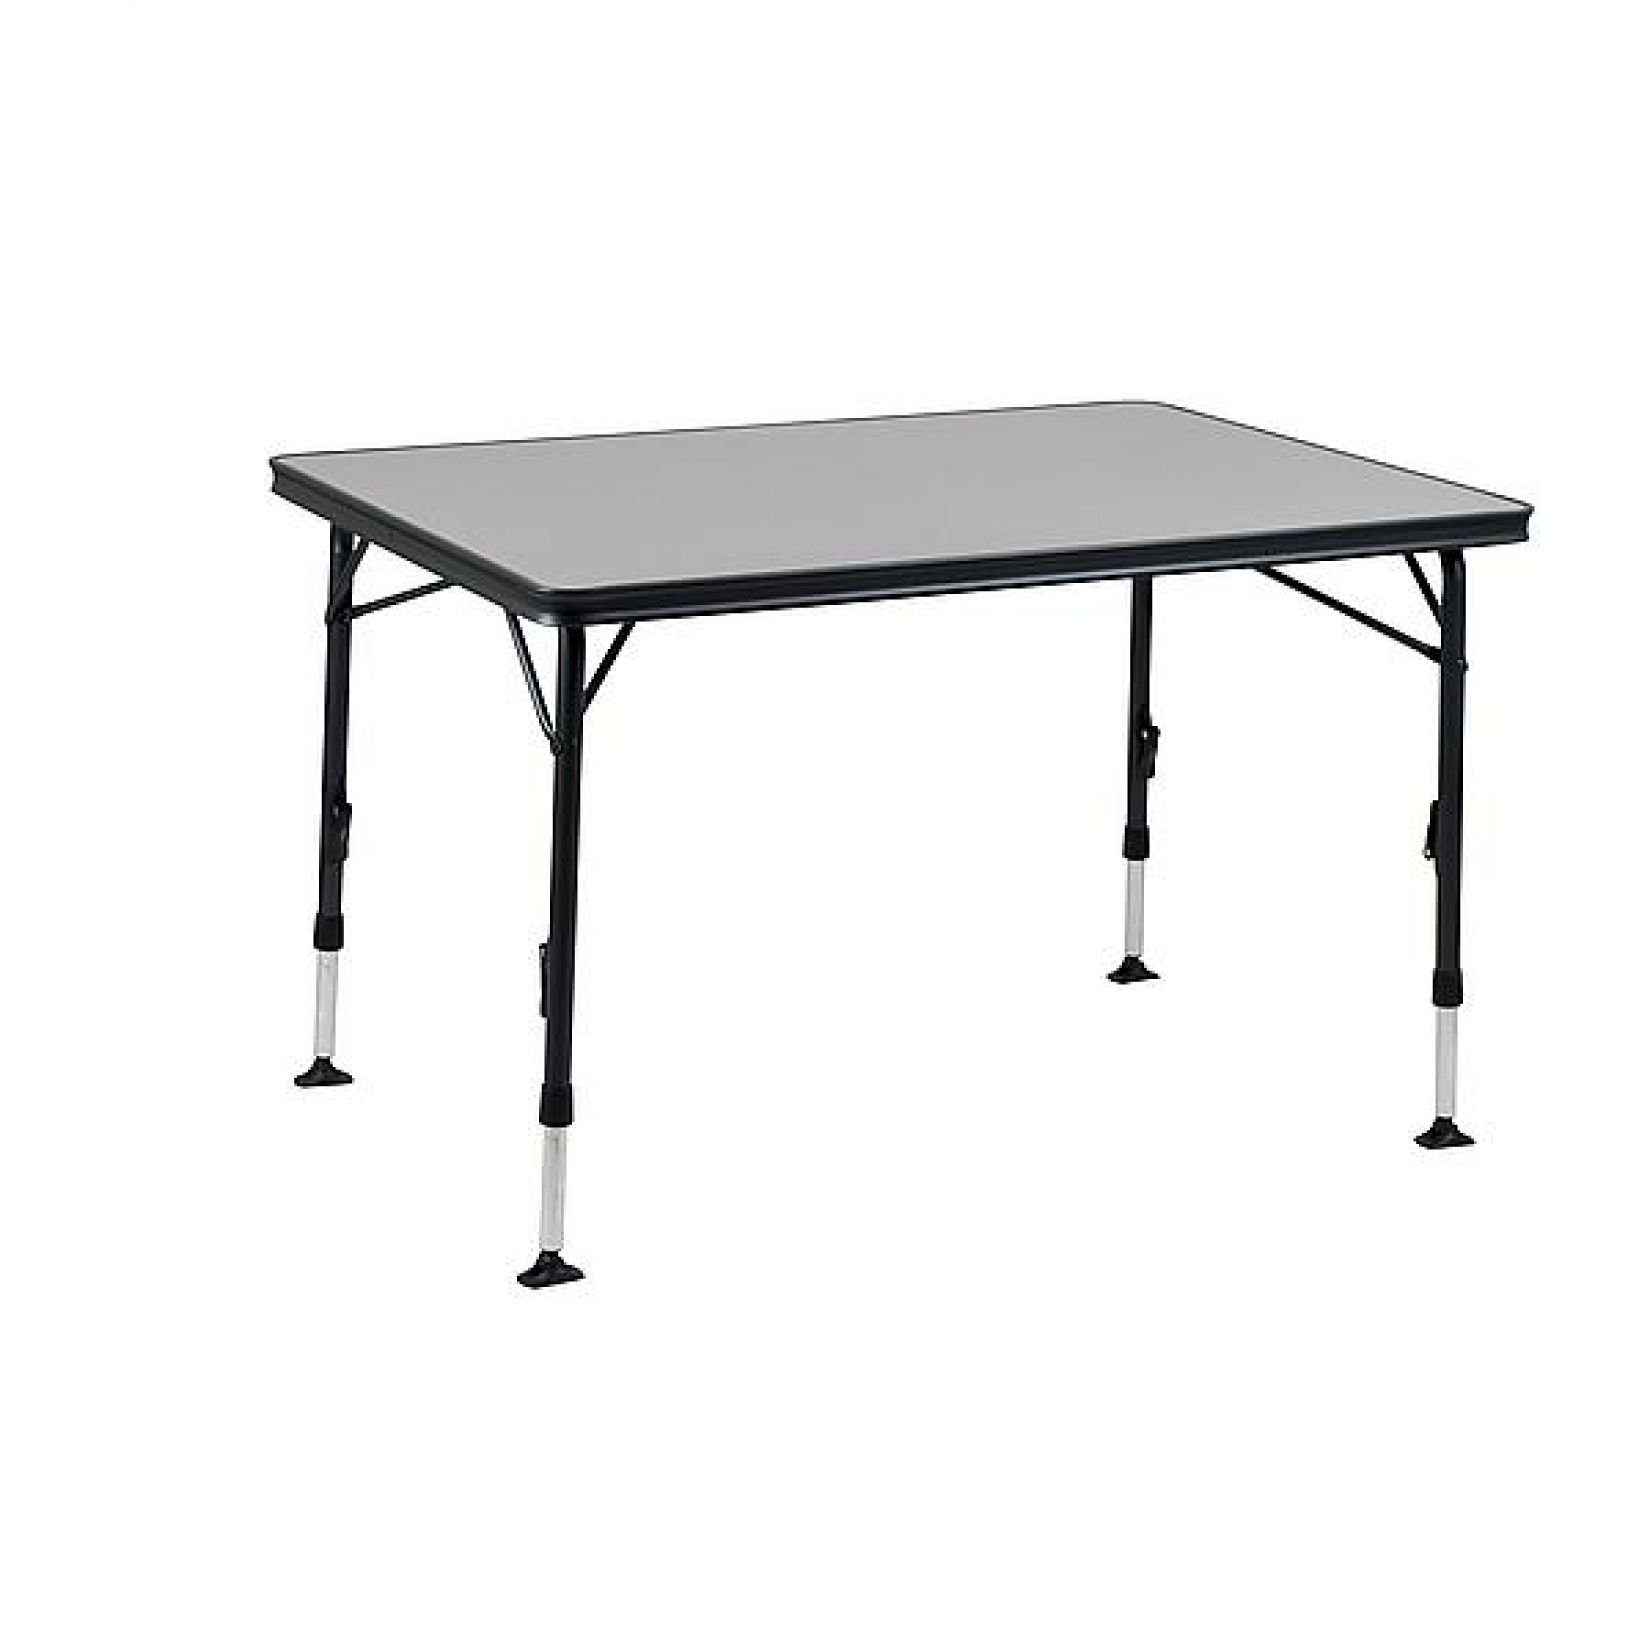 crespo tafel ap 272 120x80 alu 80 zwart the camping store. Black Bedroom Furniture Sets. Home Design Ideas